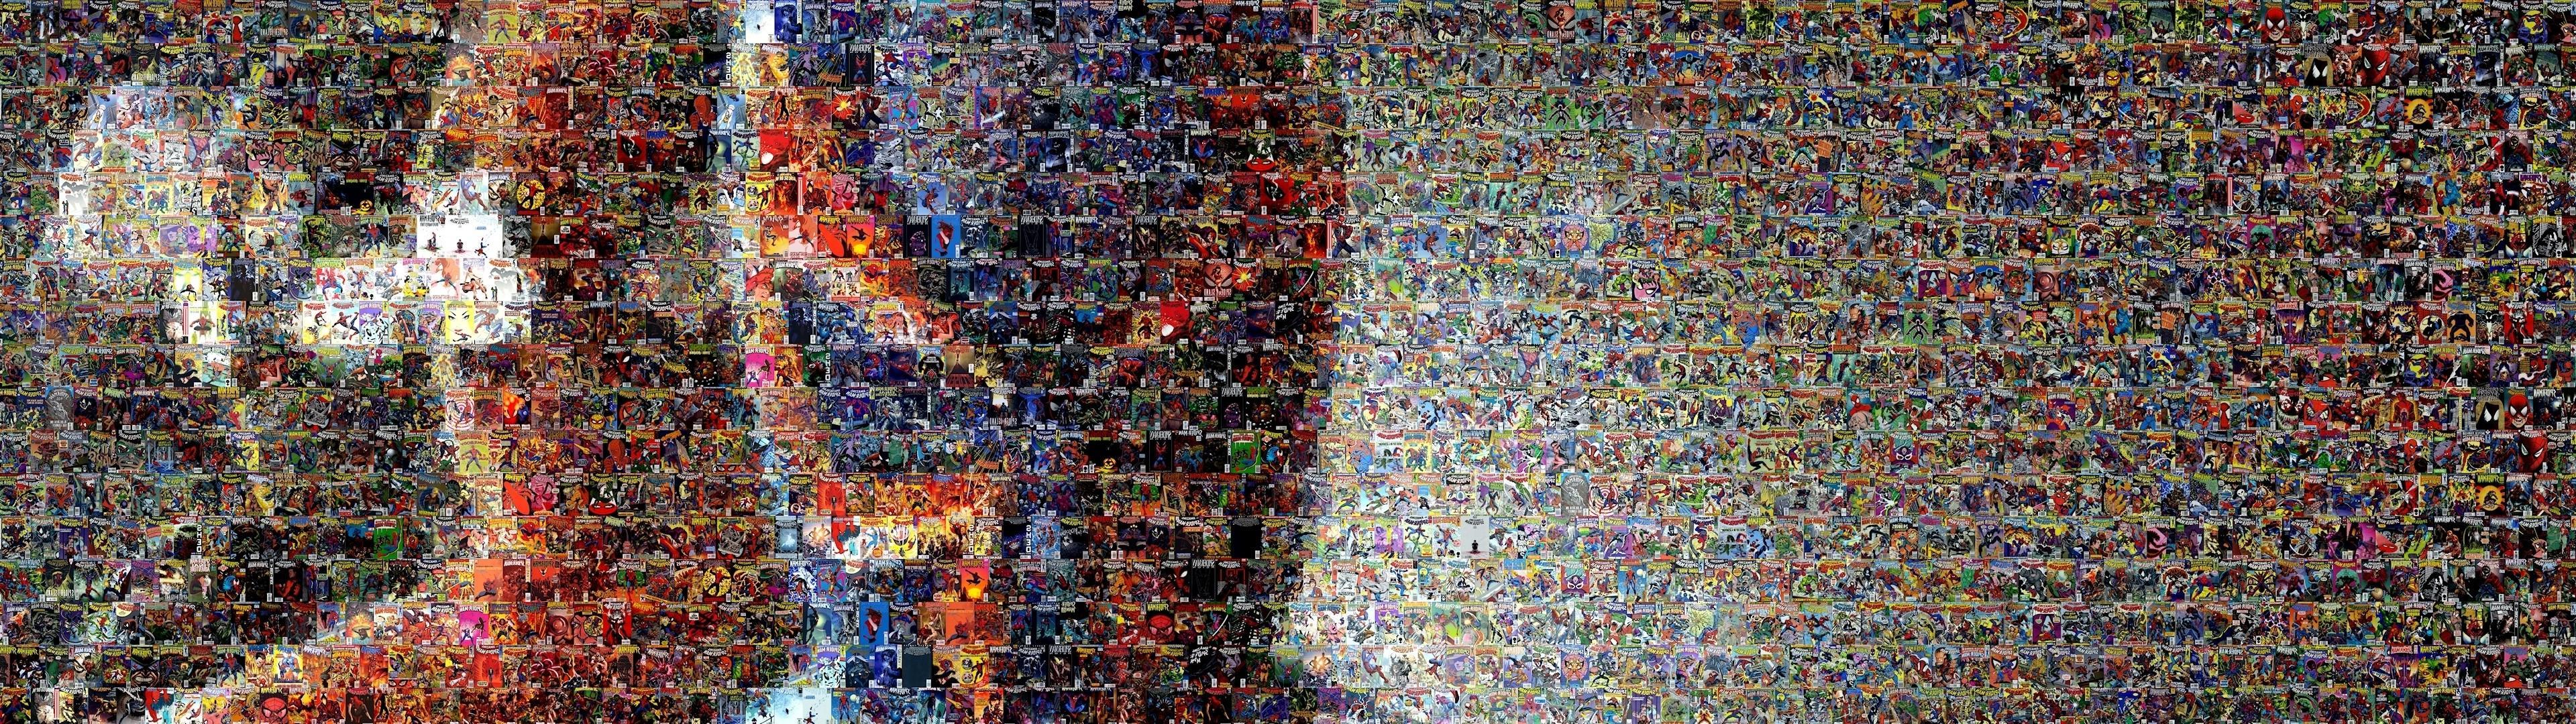 Wonderful Wallpaper Marvel Abstract - 3840x1080-px-collage-comics-dual-marvel-mosaic-multi-screen-spiderman-803489  Pic_639474.jpg